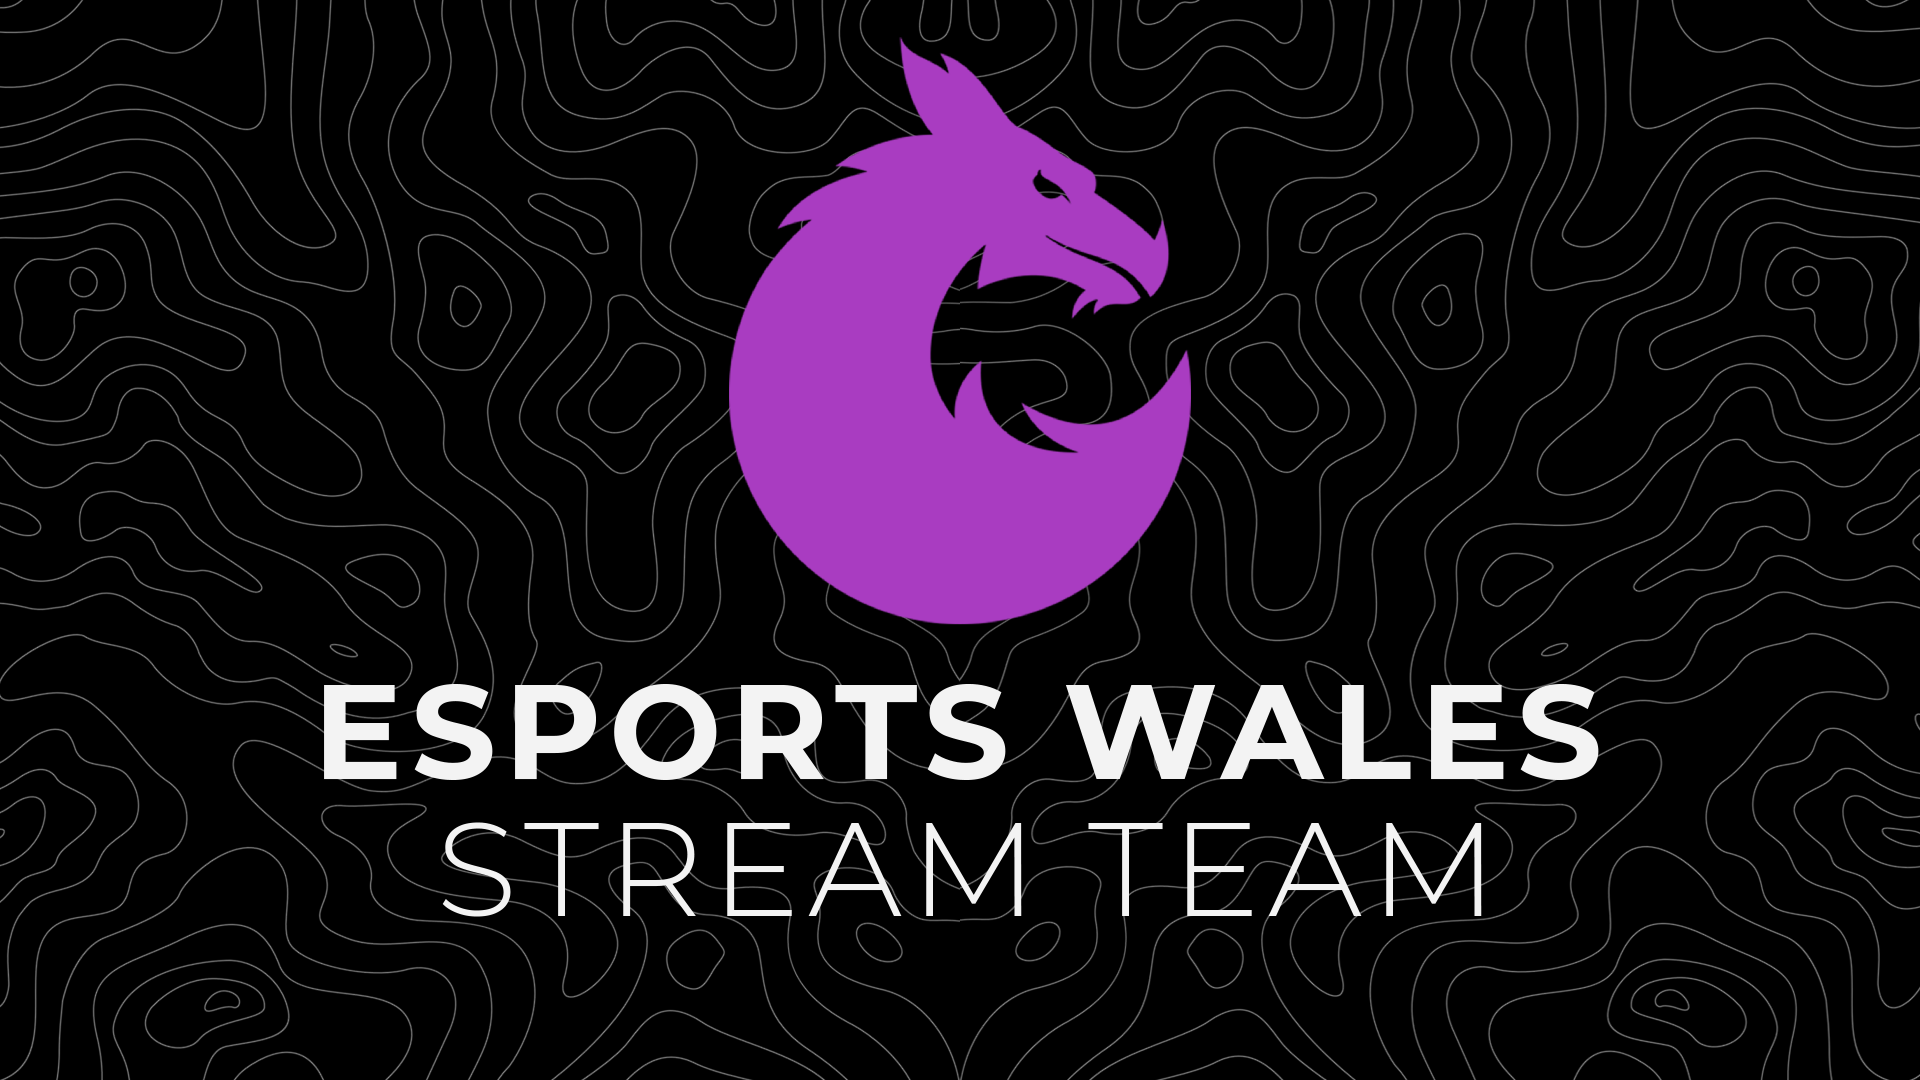 Esports Wales Stream team